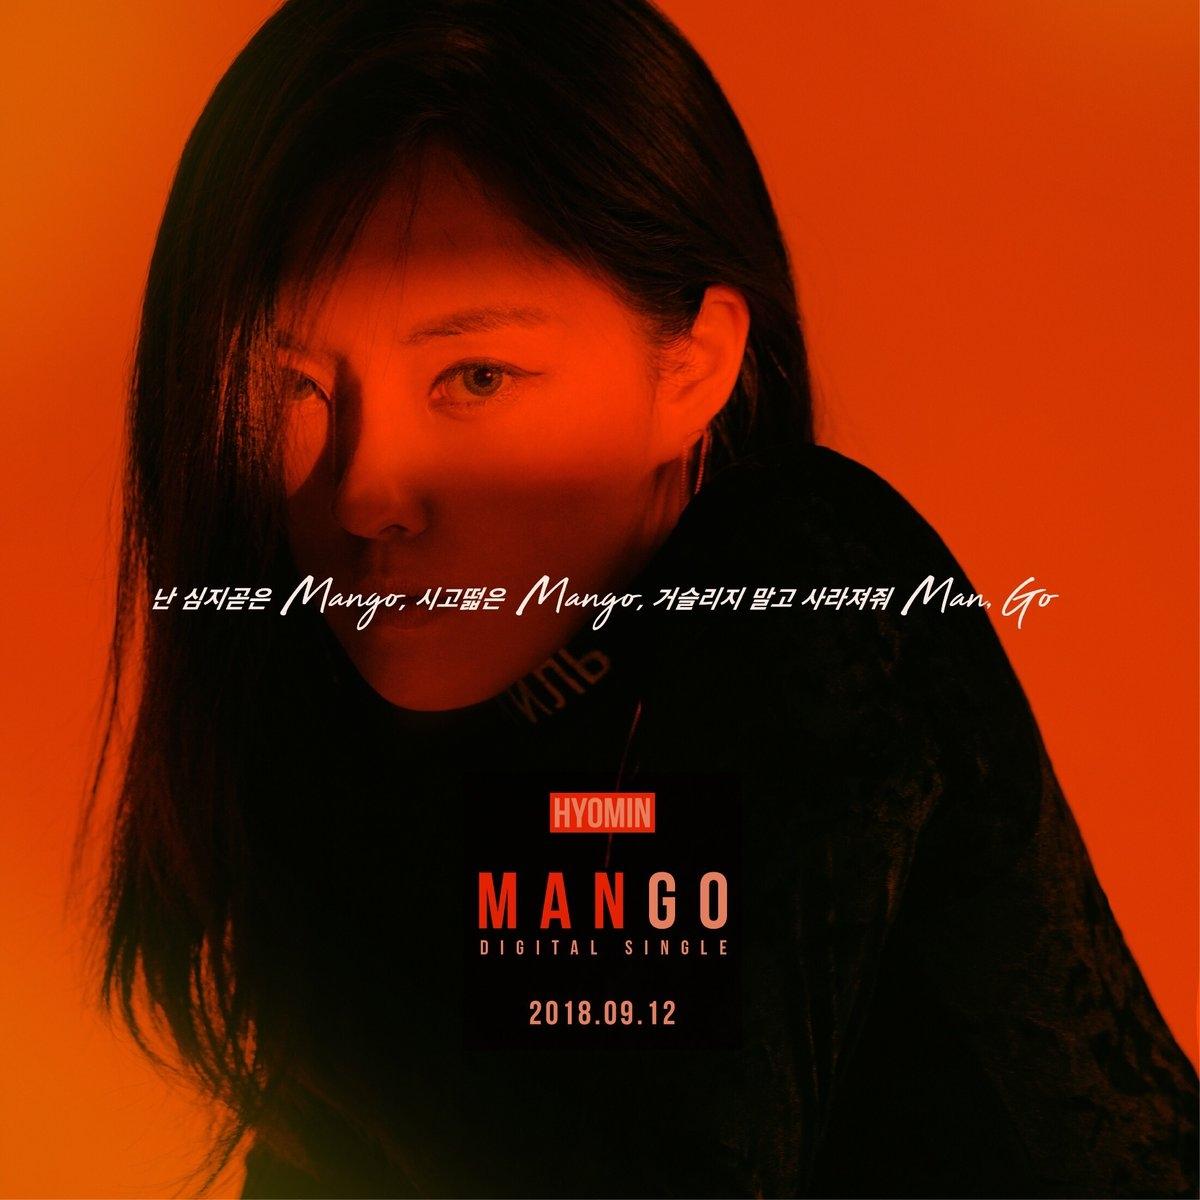 T-ara Hyomin Mango teaser 2